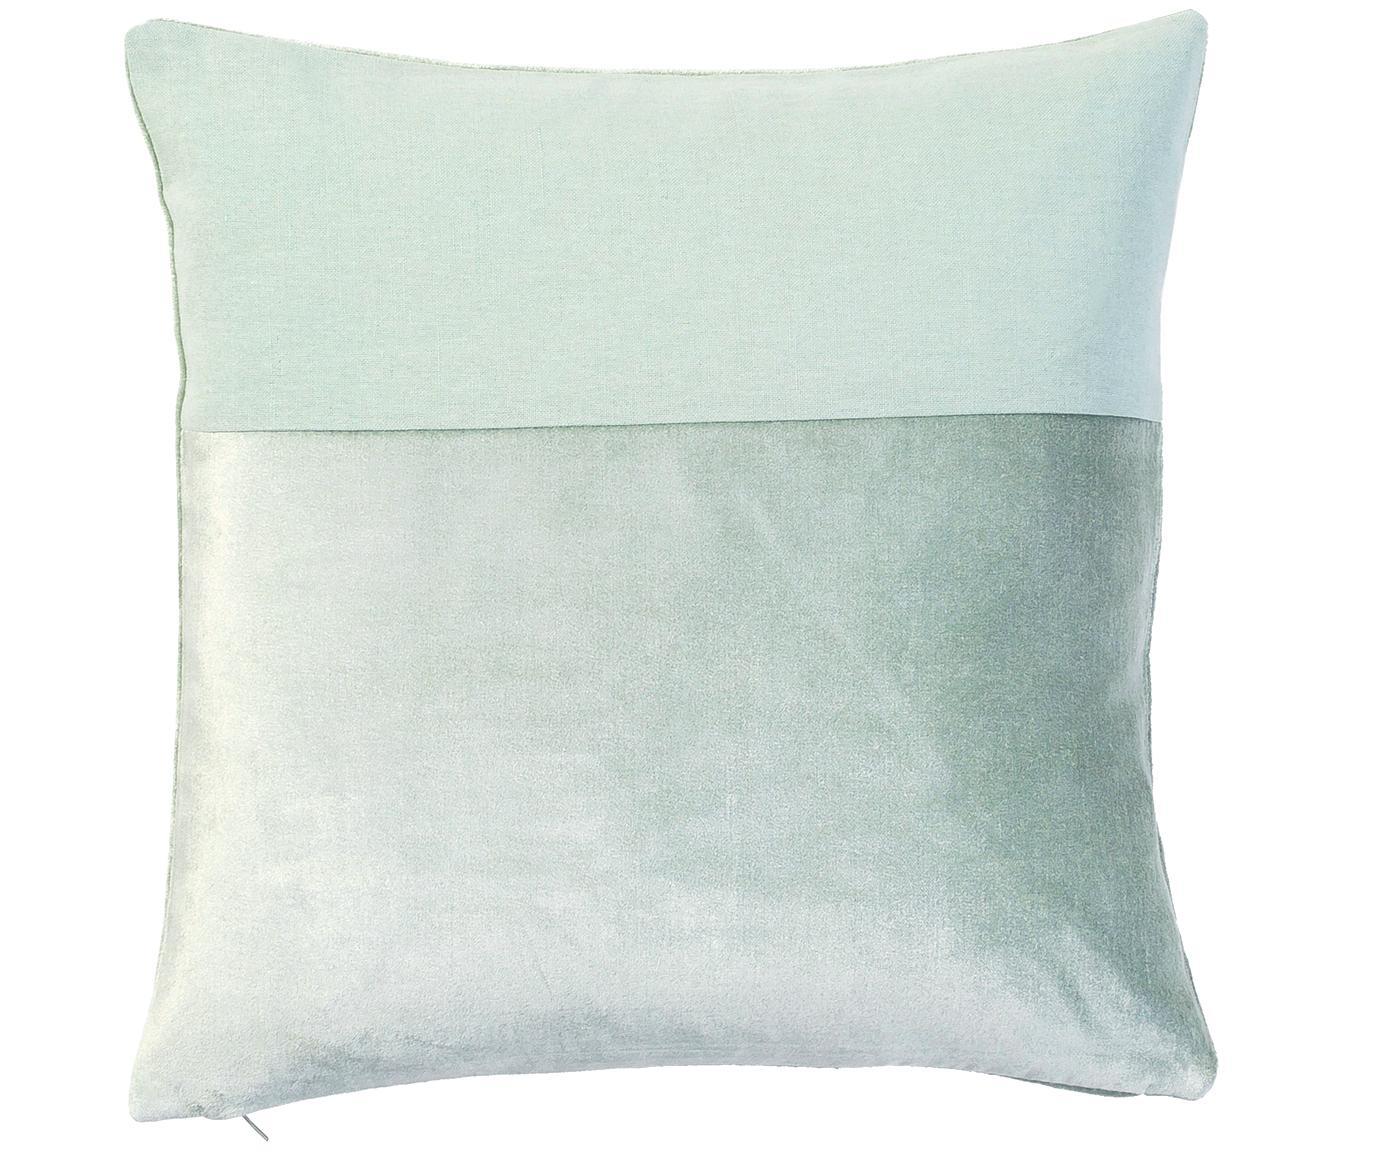 Funda de cojín de terciopelo y lino Adelaide, Parte superior: 50%algodón, 50%lino, Verde salvia, An 40 x L 40 cm